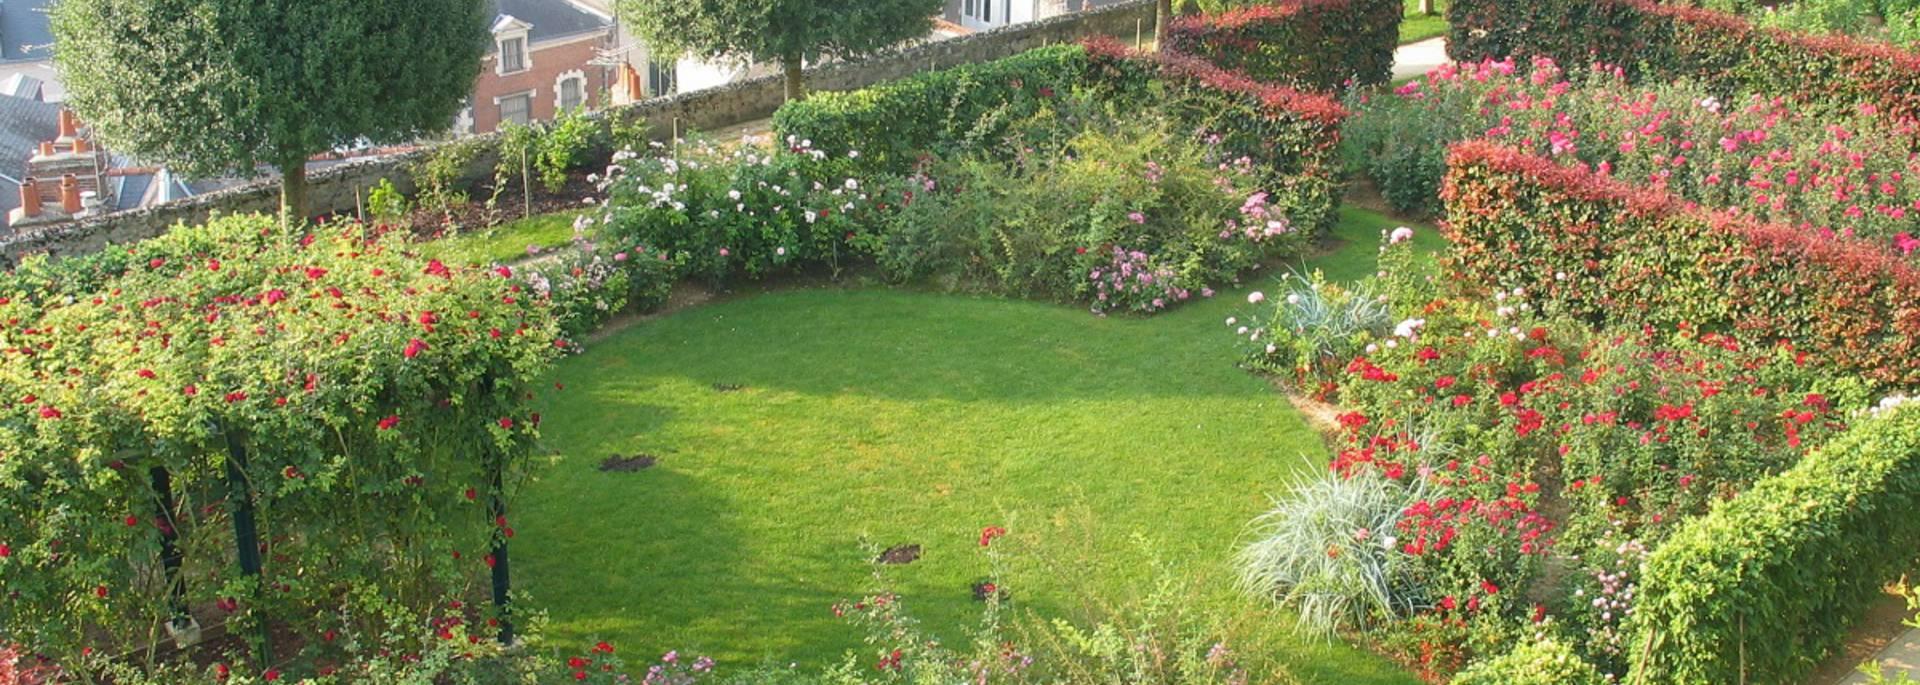 Jardines del obispado en Blois